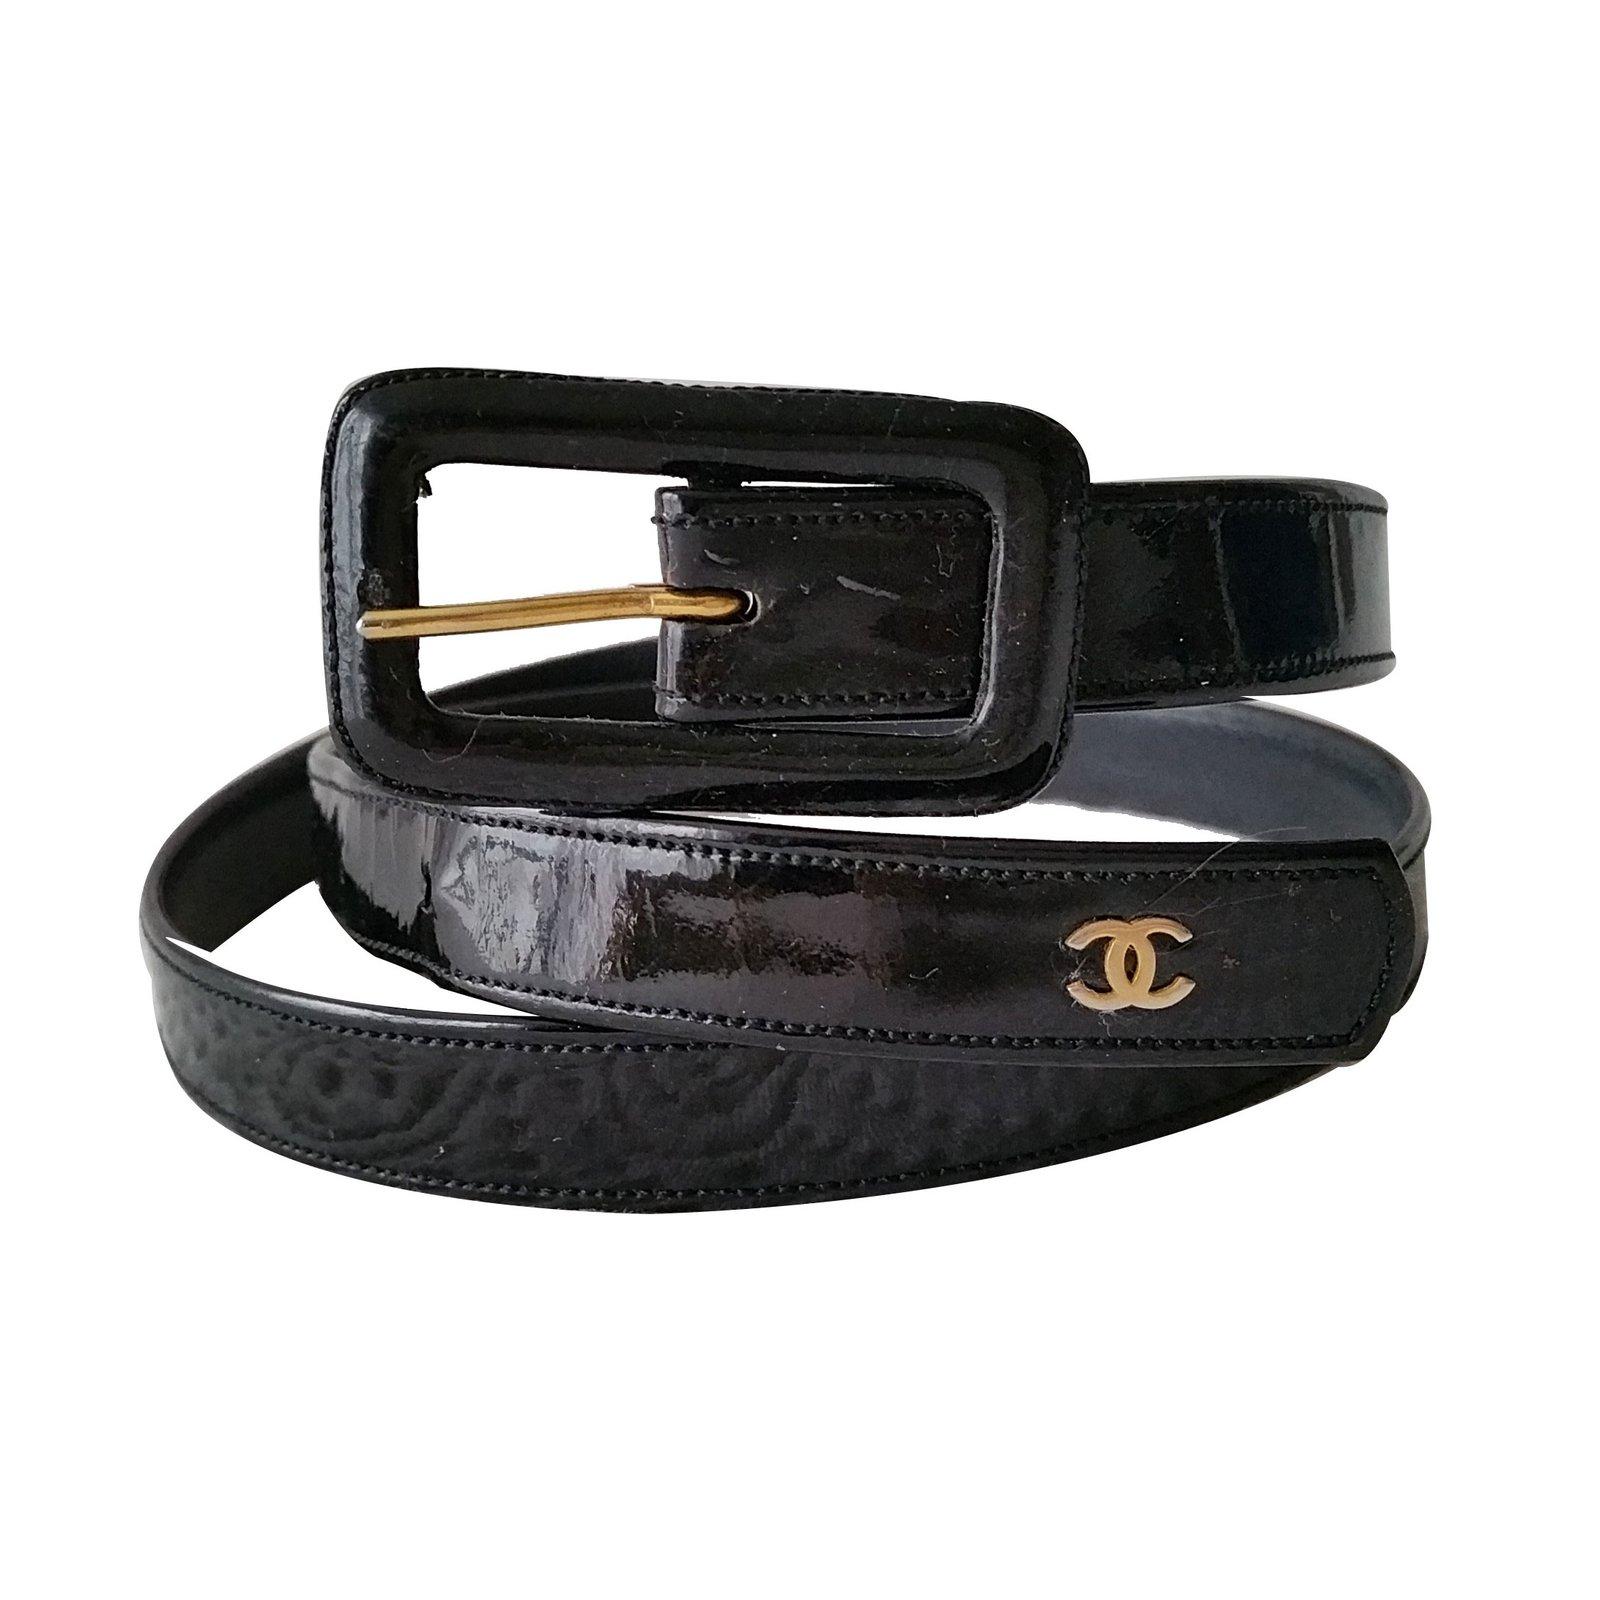 chanel belts belts patent leather black ref 13107 joli